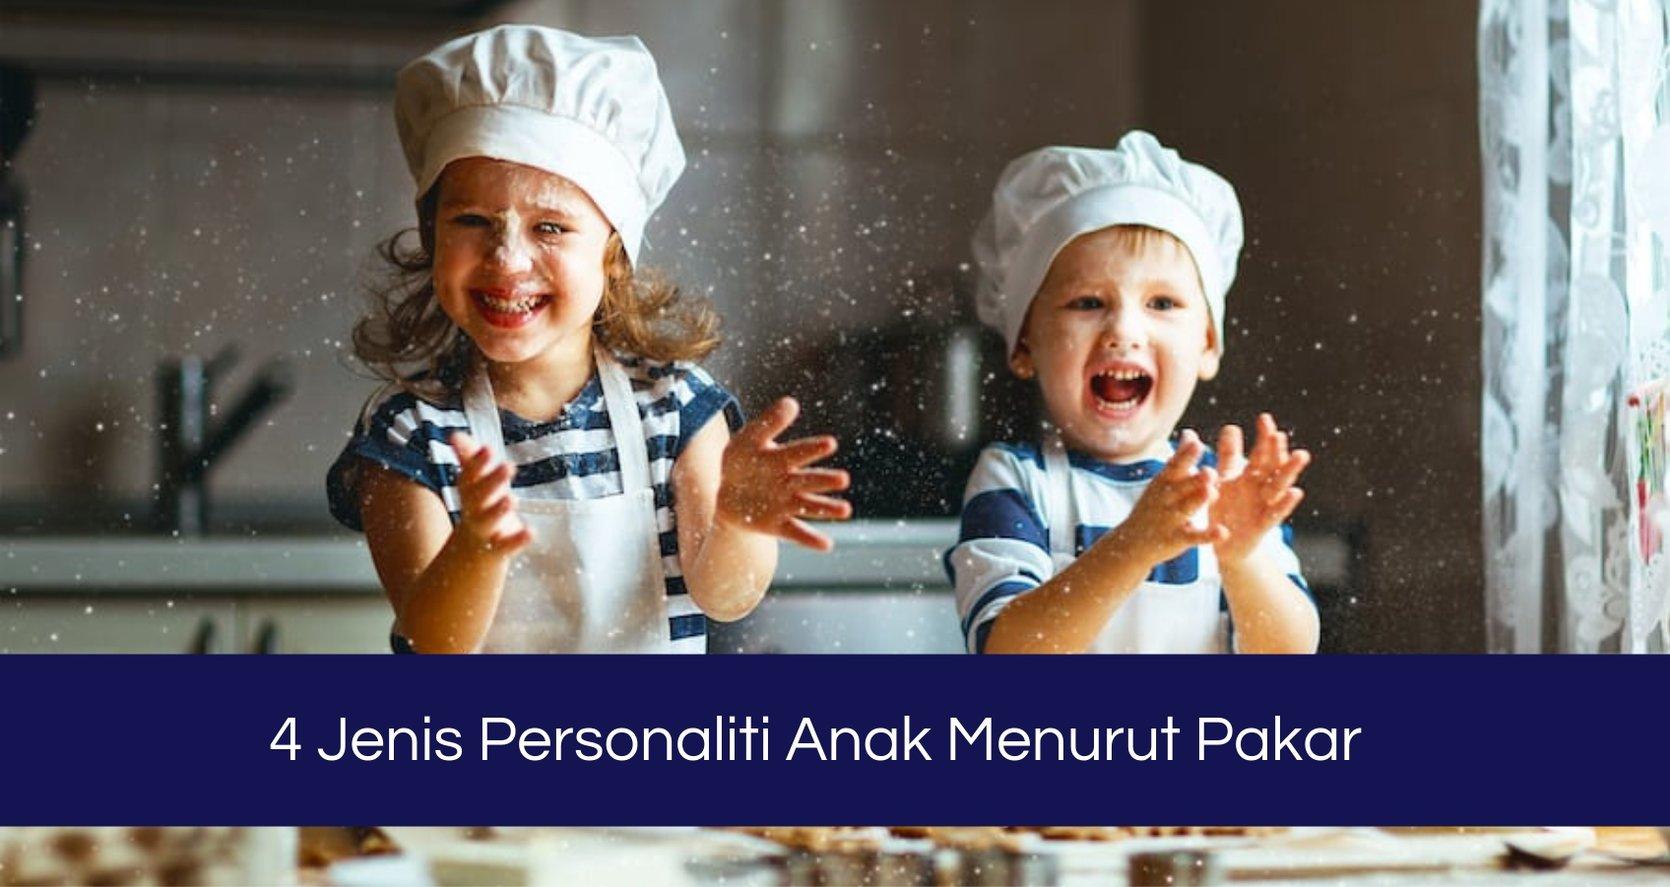 4 Jenis Personaliti Anak Menurut Pakar.